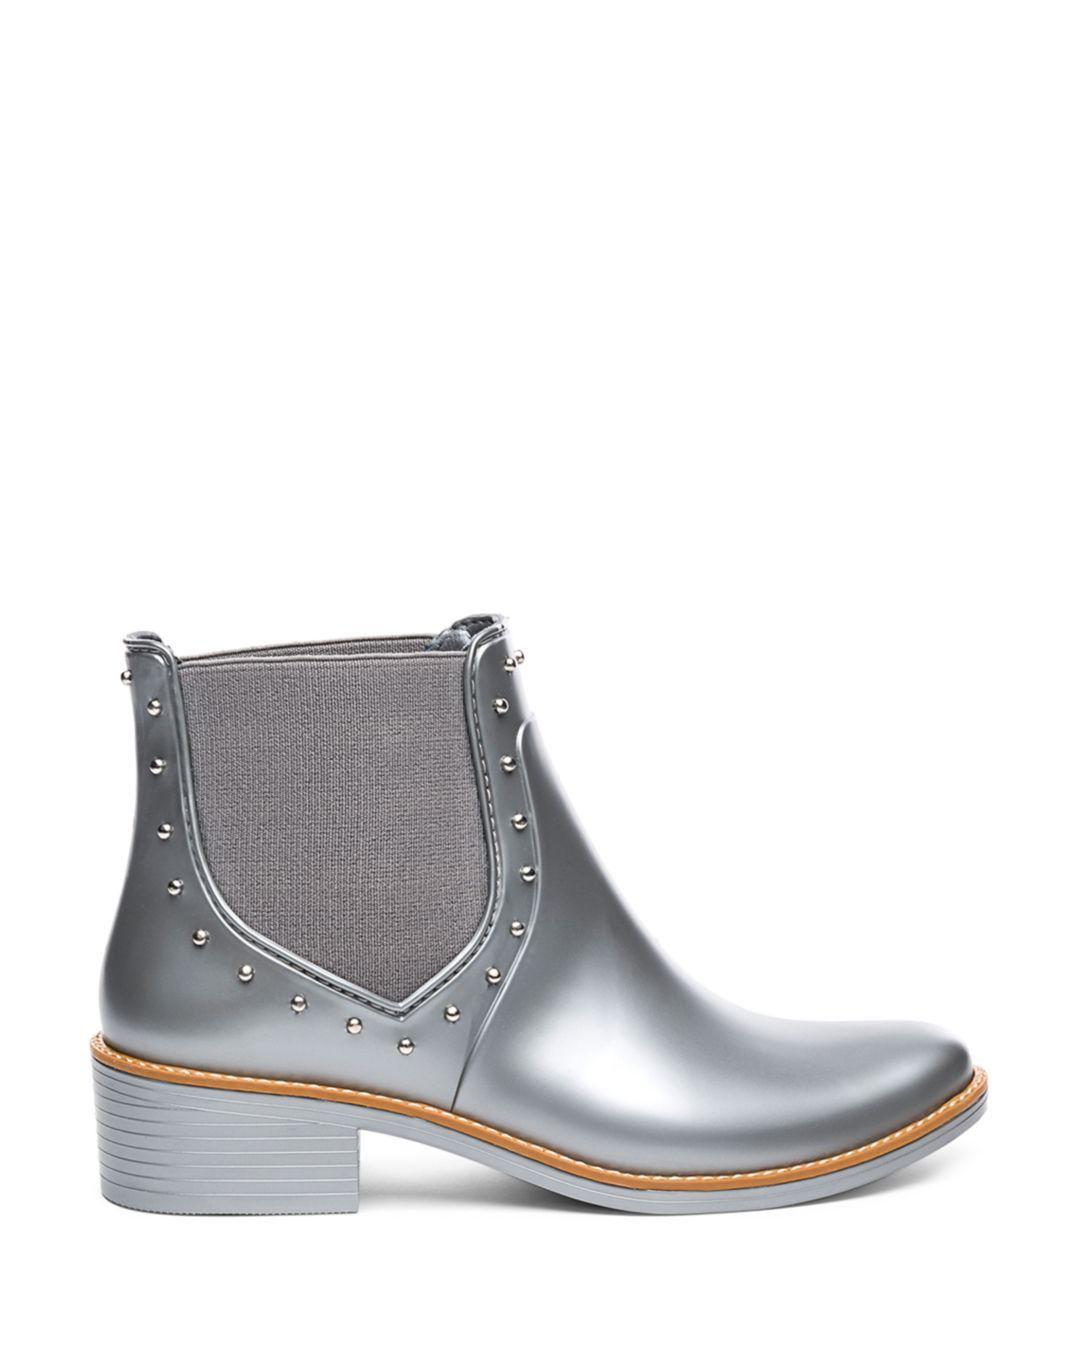 4b939b24ebb1a3 Bernardo Peyton Studded Rubber Rain Ankle Boots in Gray - Lyst